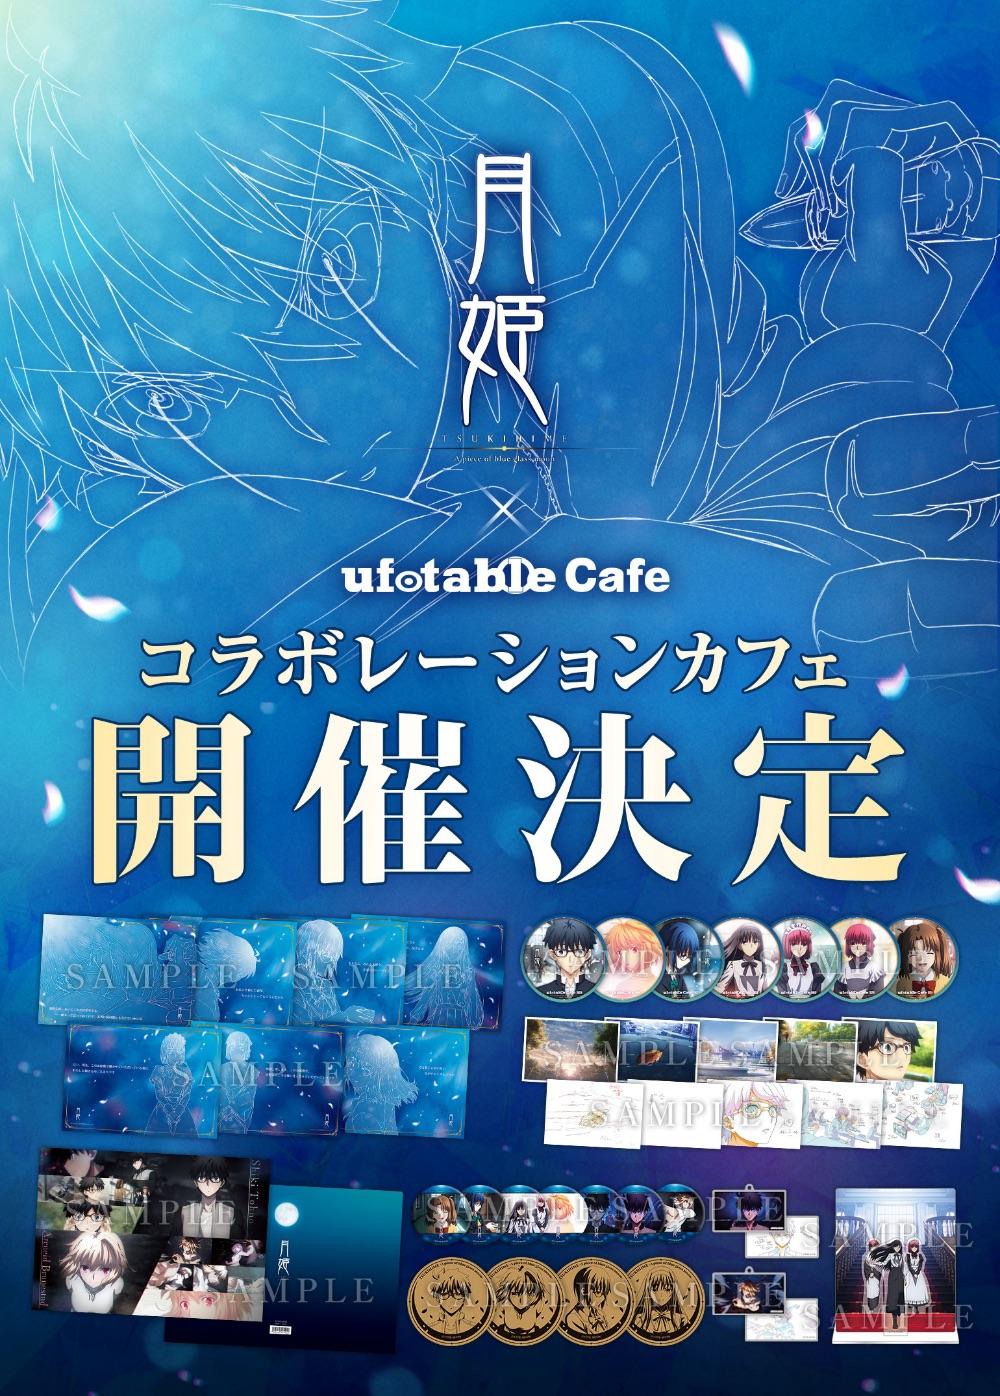 【ufotable Cafe東京】「月姫 -A piece of blue glass moon-」コラボレーションカフェ